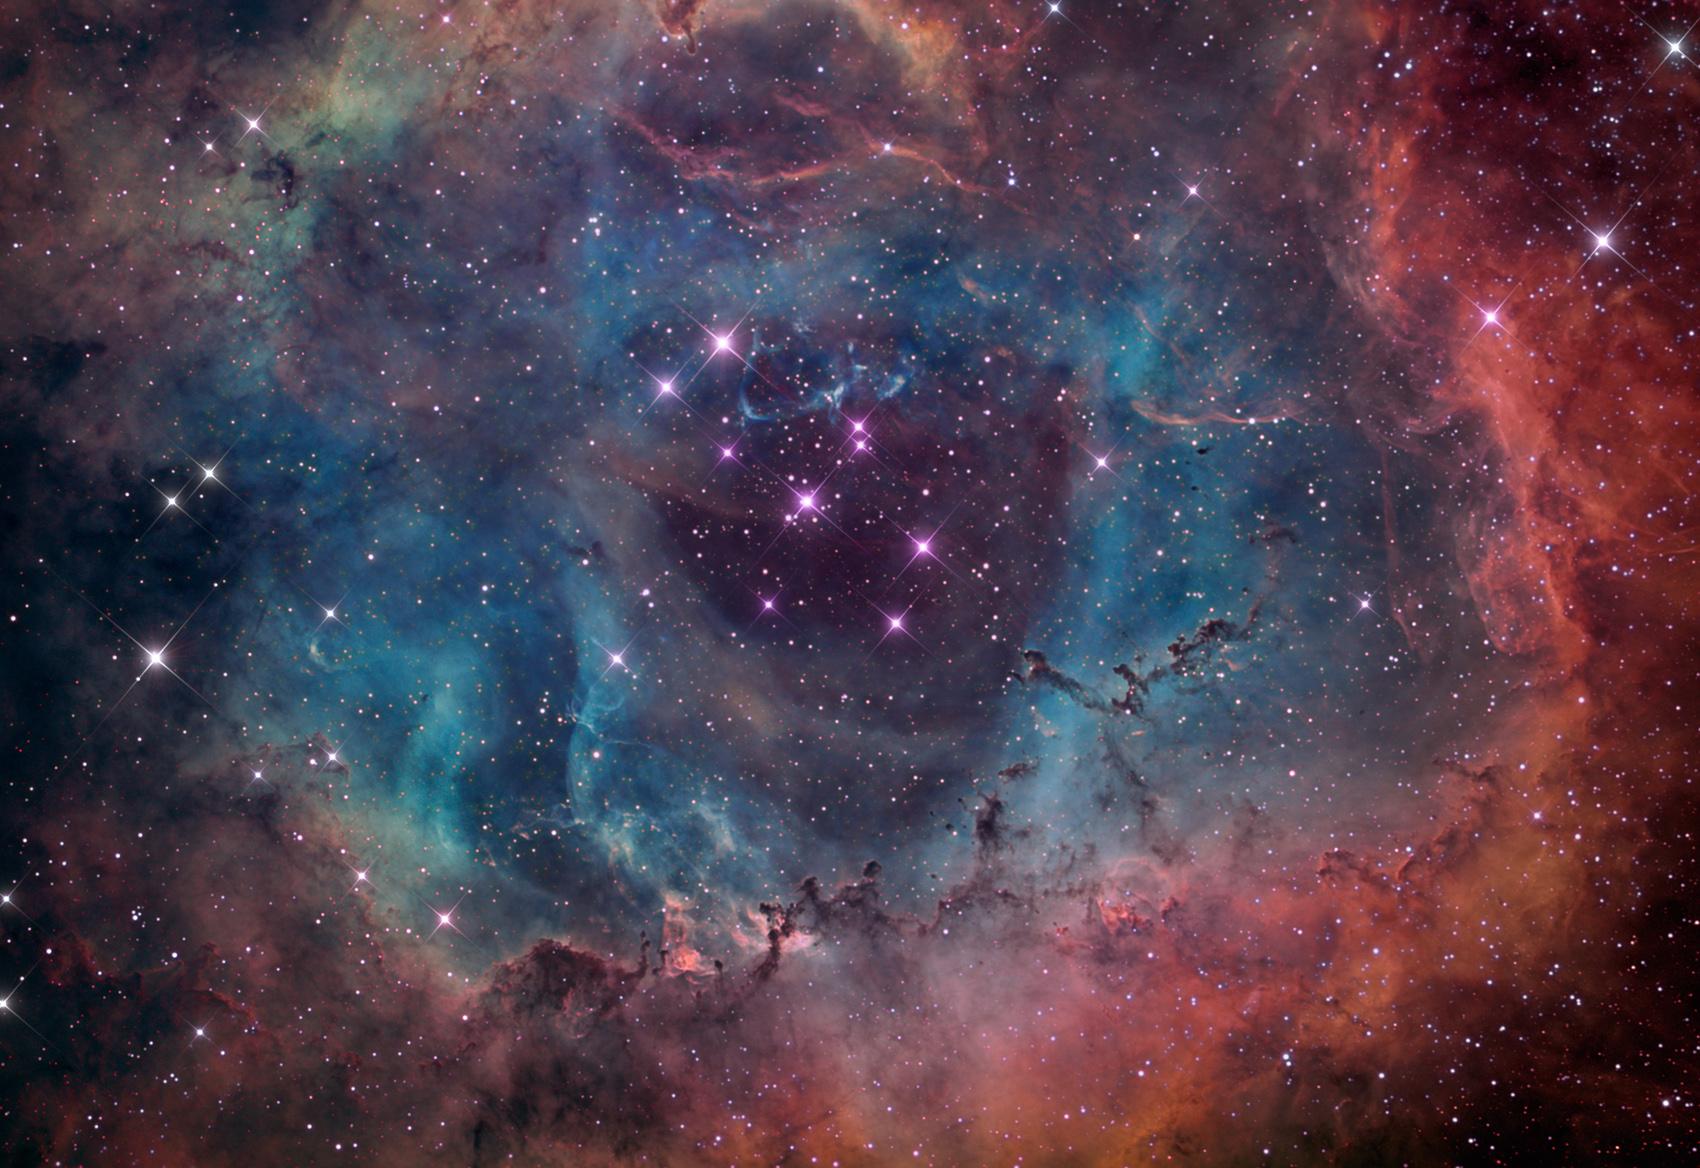 Space Nebula Wallpapers wallpaper Space Nebula Wallpapers hd 1700x1168